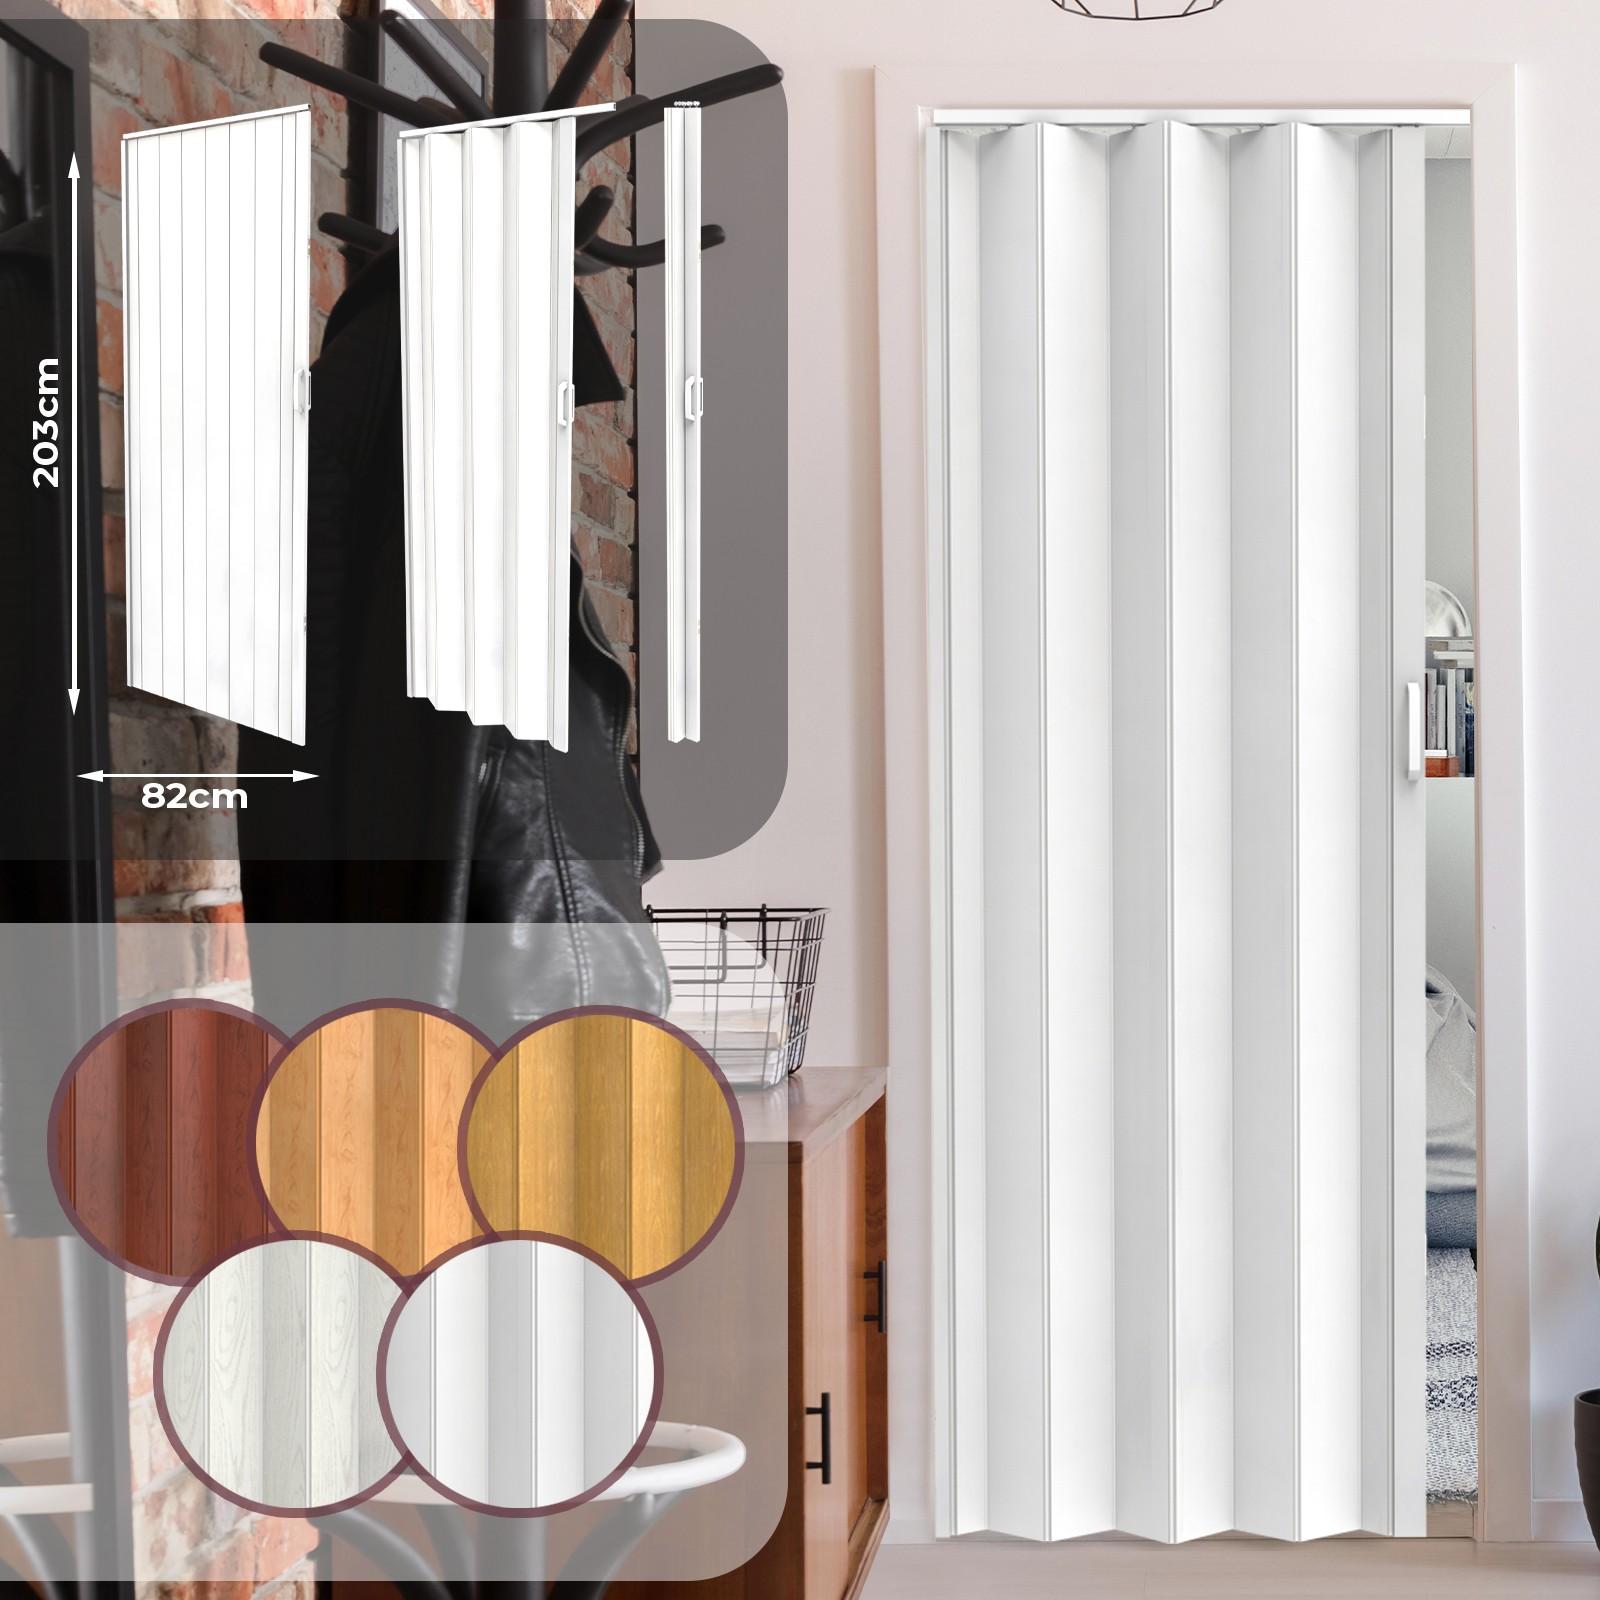 Porta A Soffietto Bianca ca porta pieghevole in pvc 203 x 82 cm bianca jago diversi